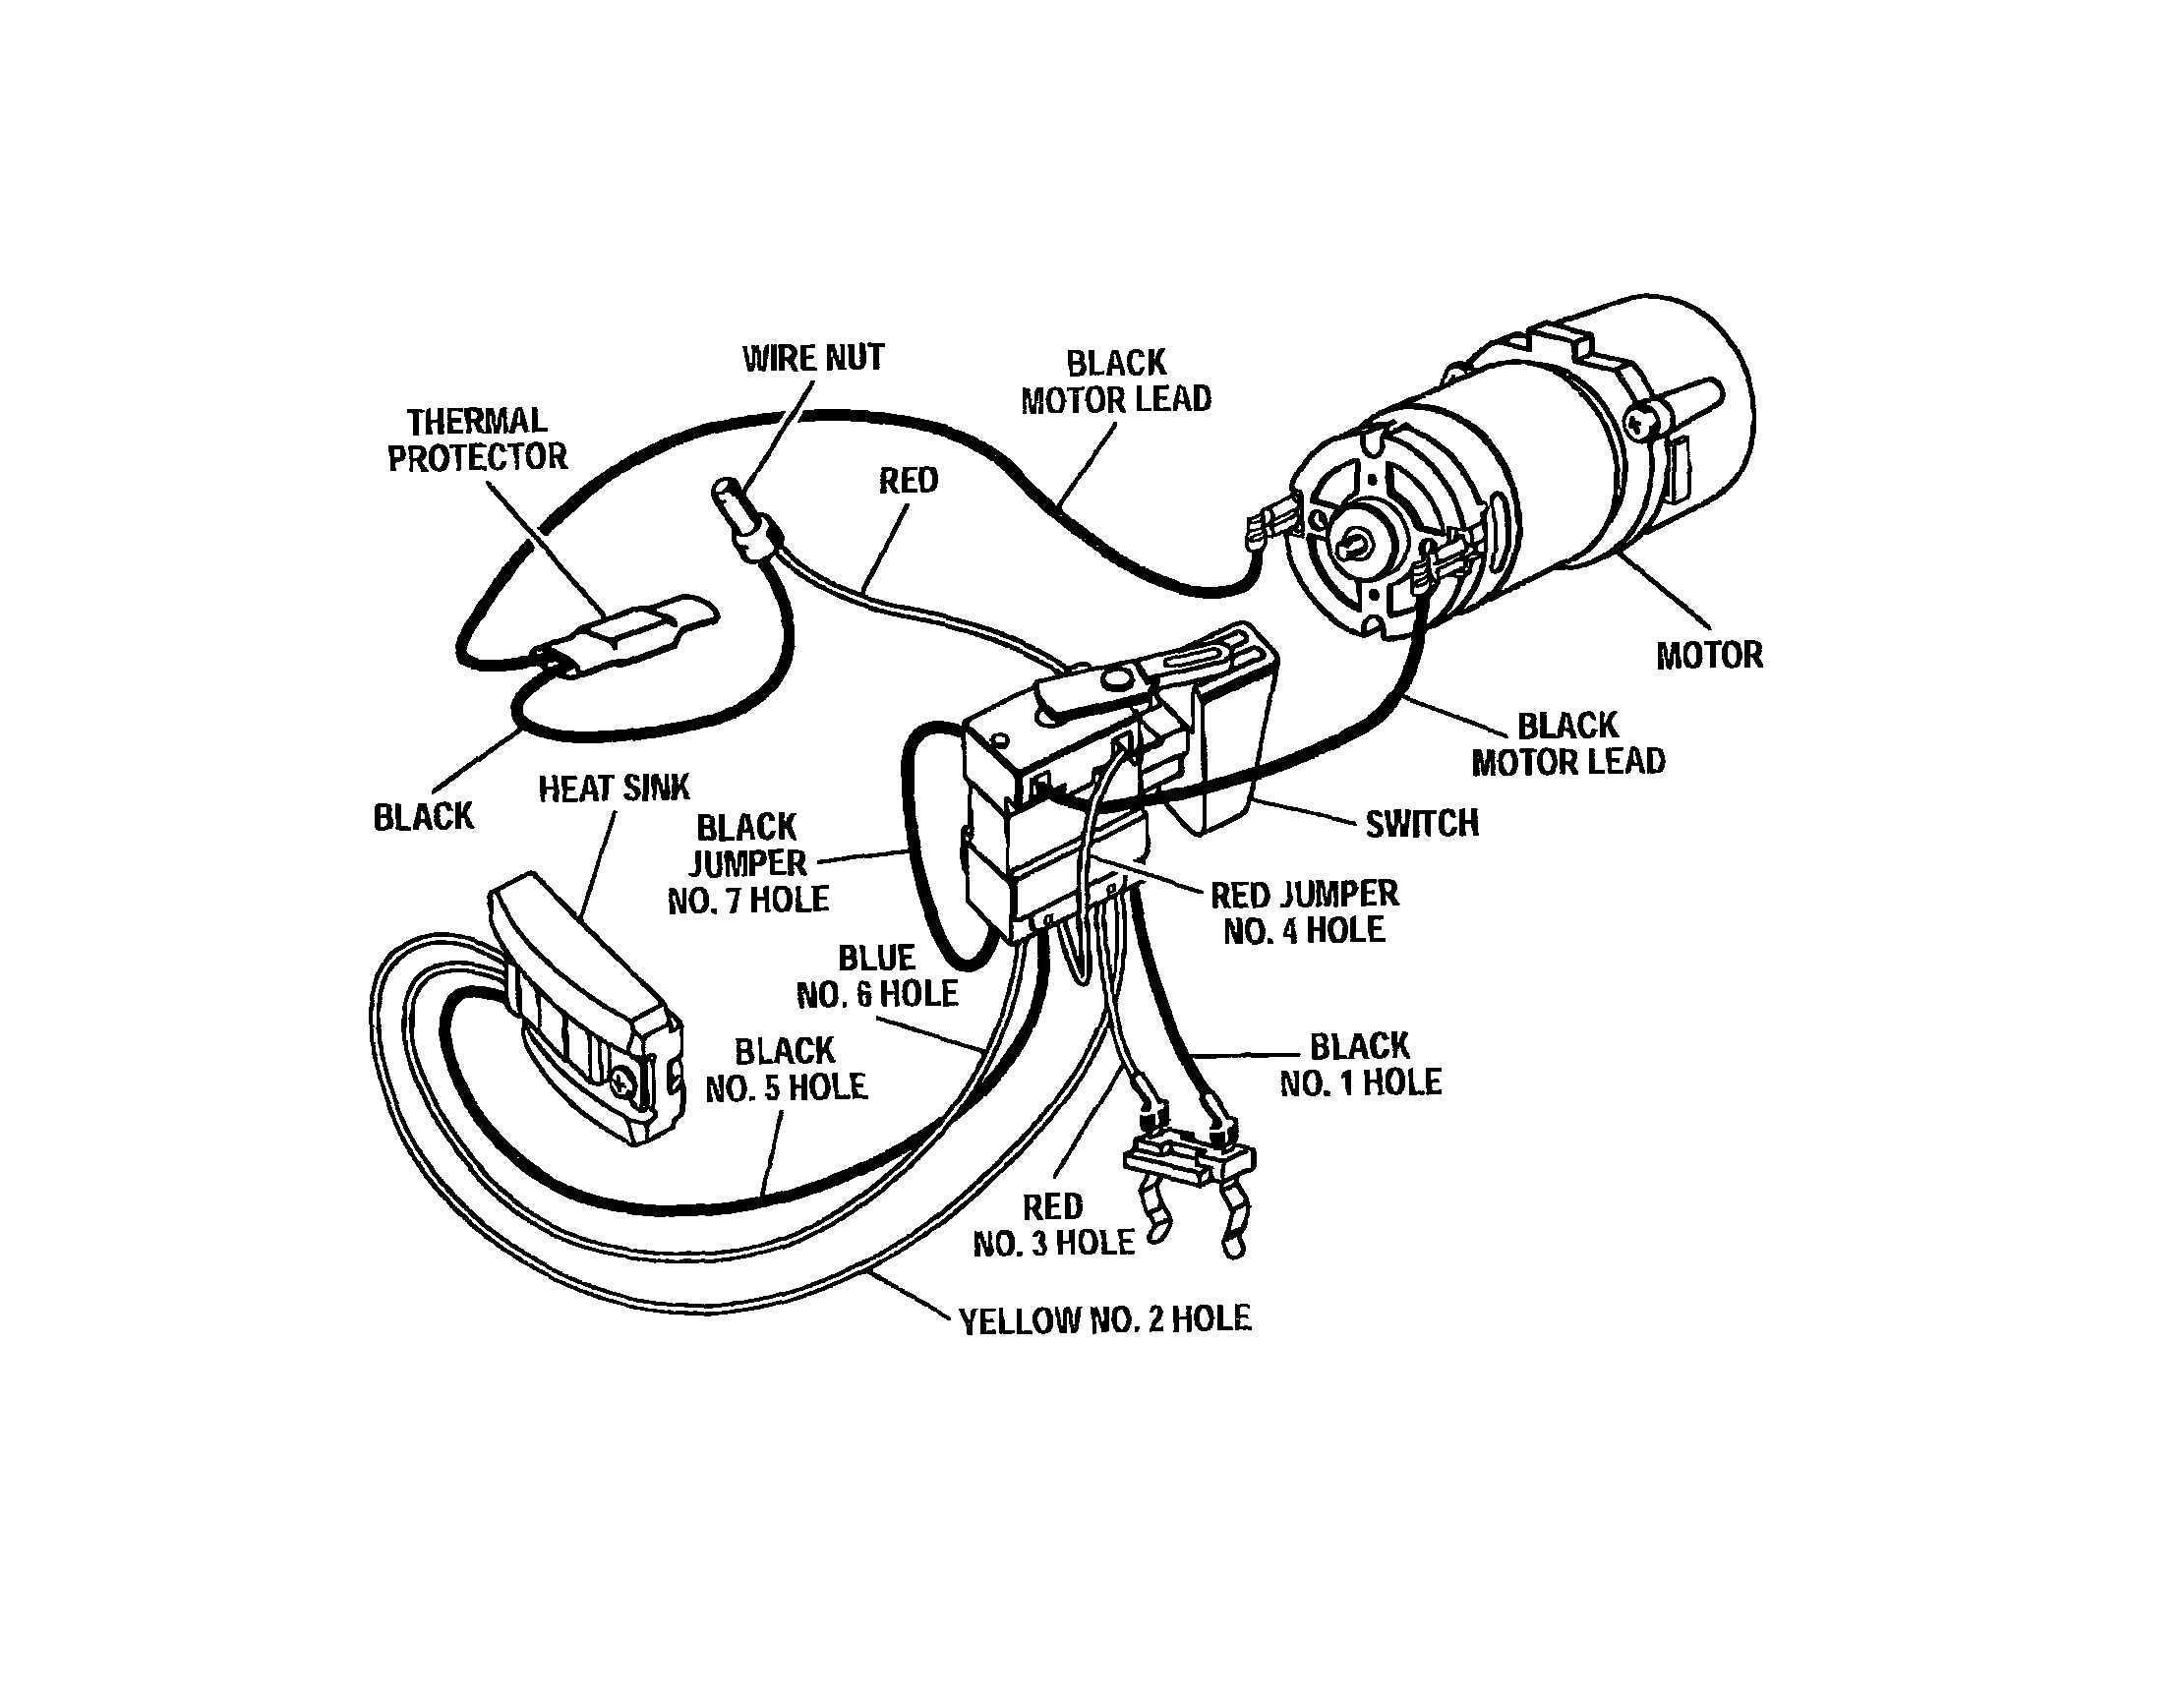 Craftsman model 973114240 drill driver genuine parts